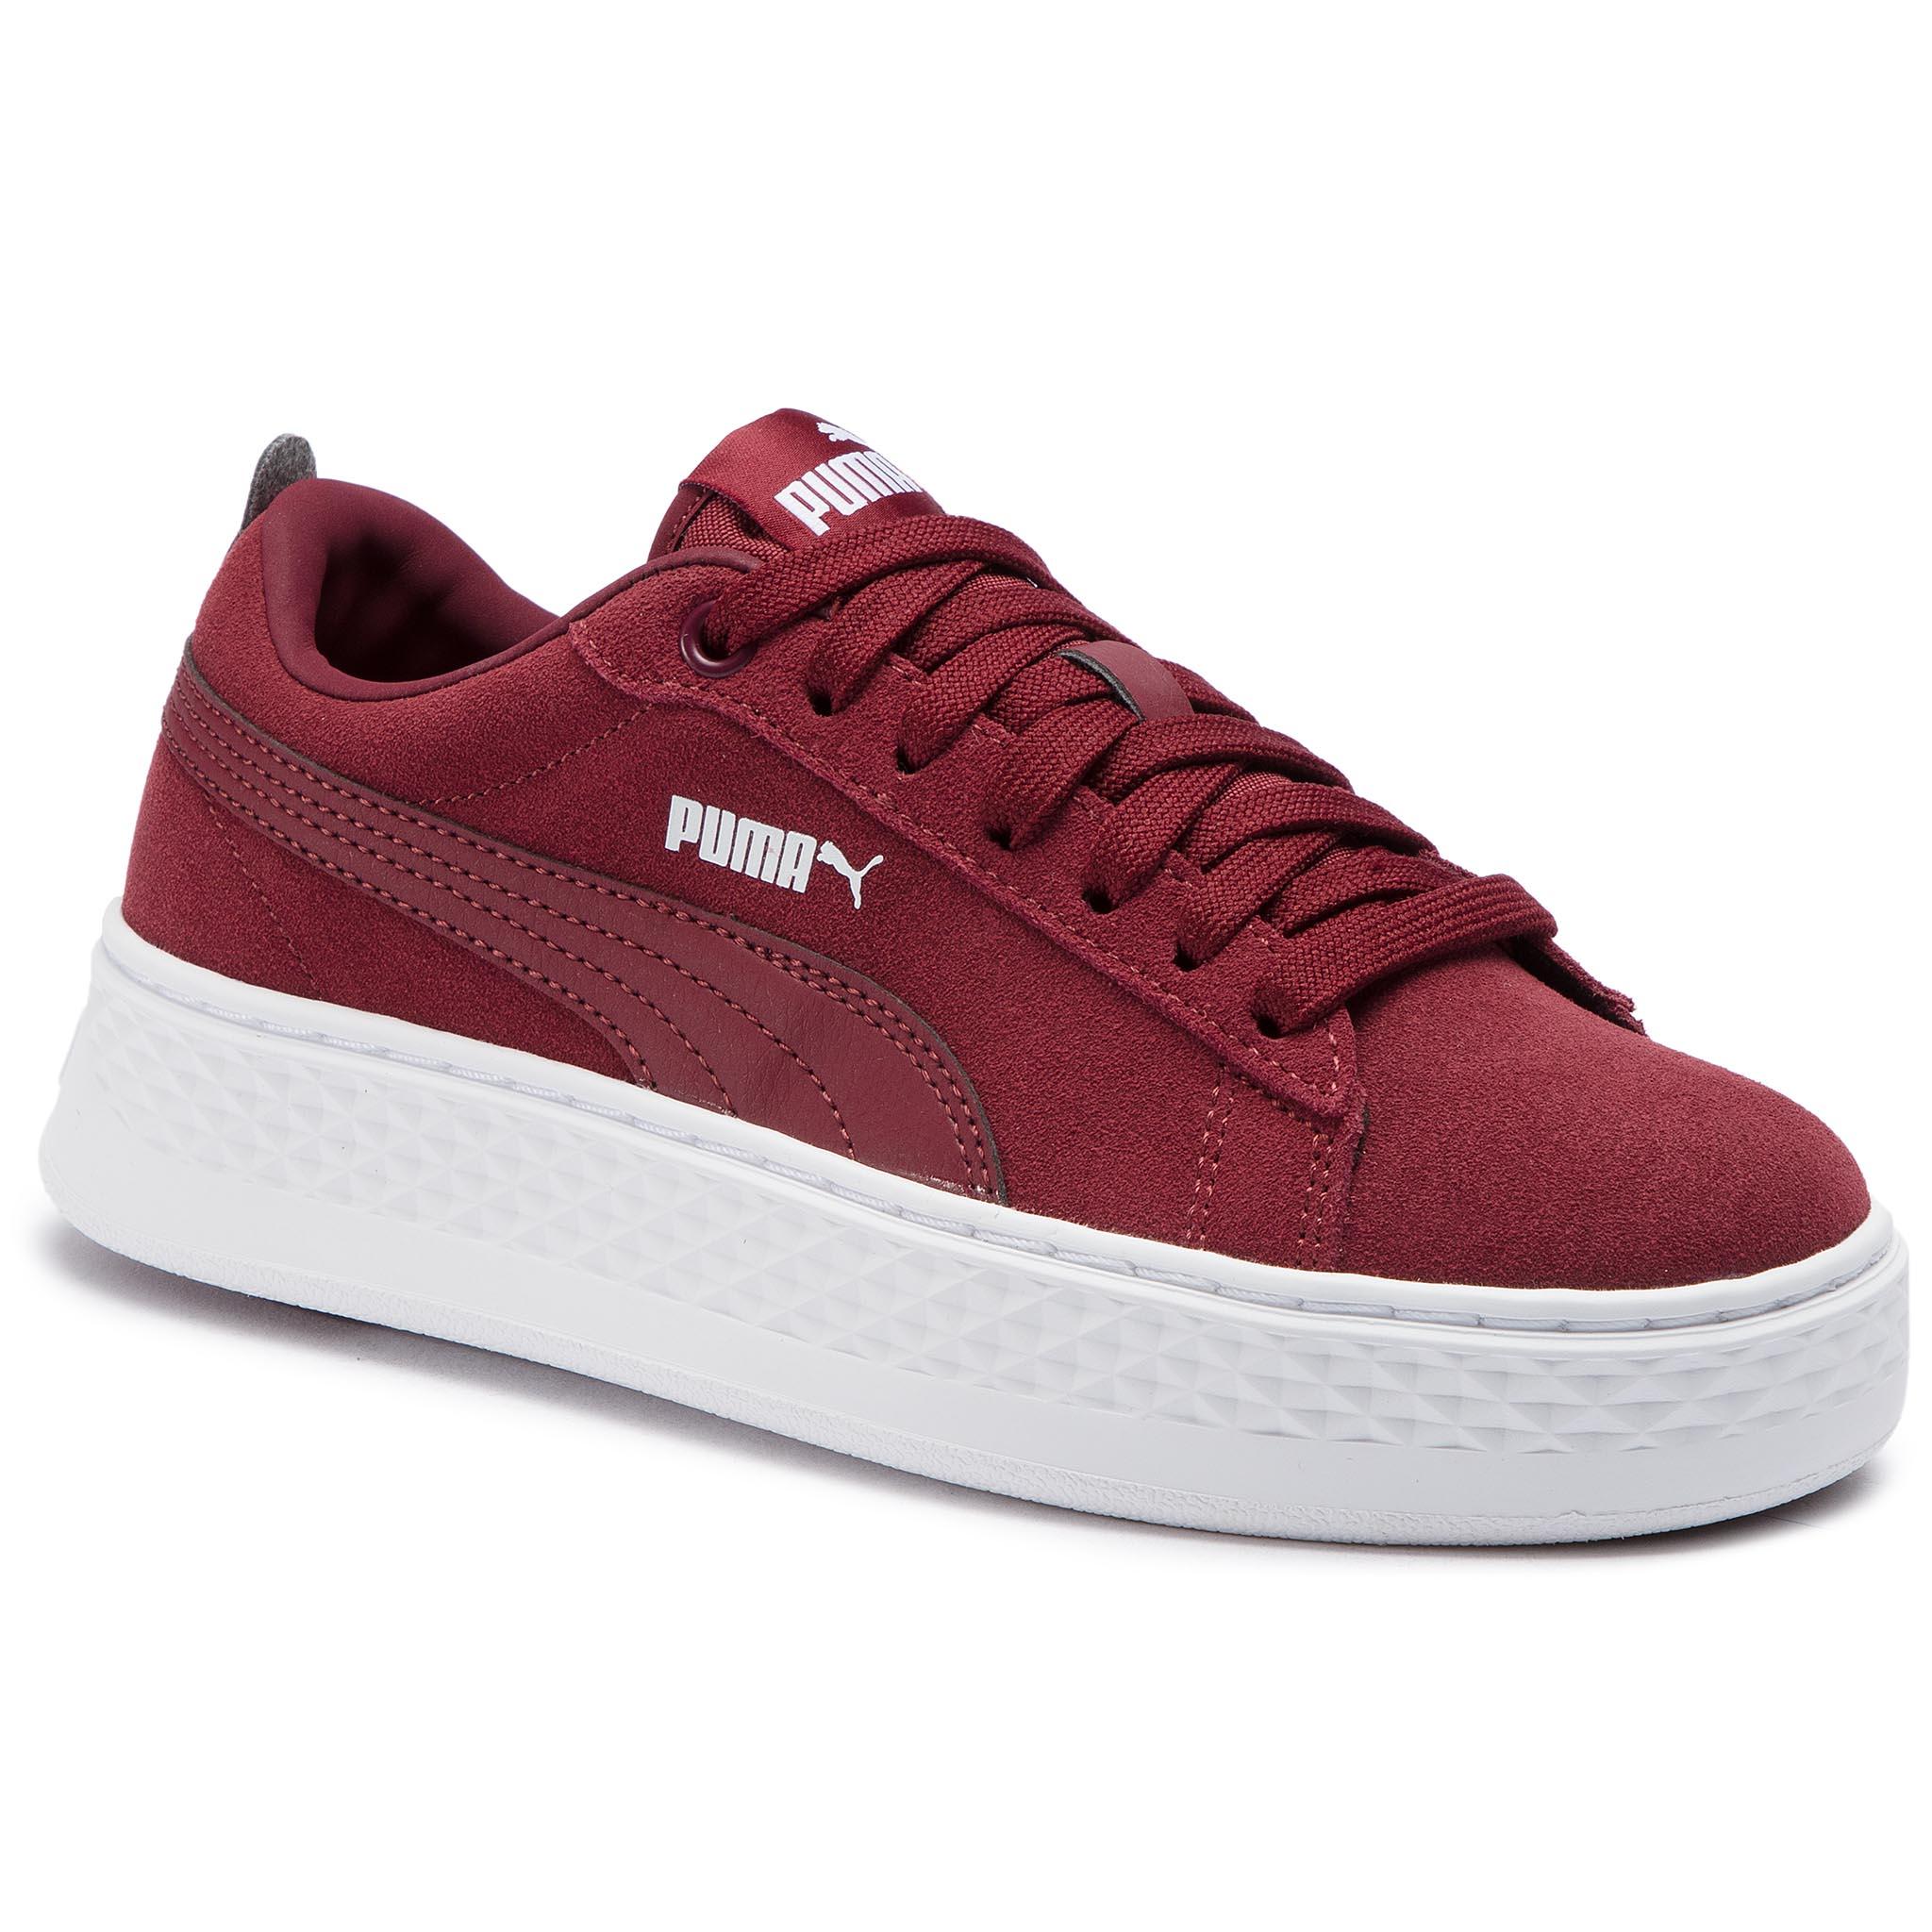 5a84d4aa7f6 Sneakers PUMA - Basket Platform Euphoria Metal 367850 01 Puma White ...